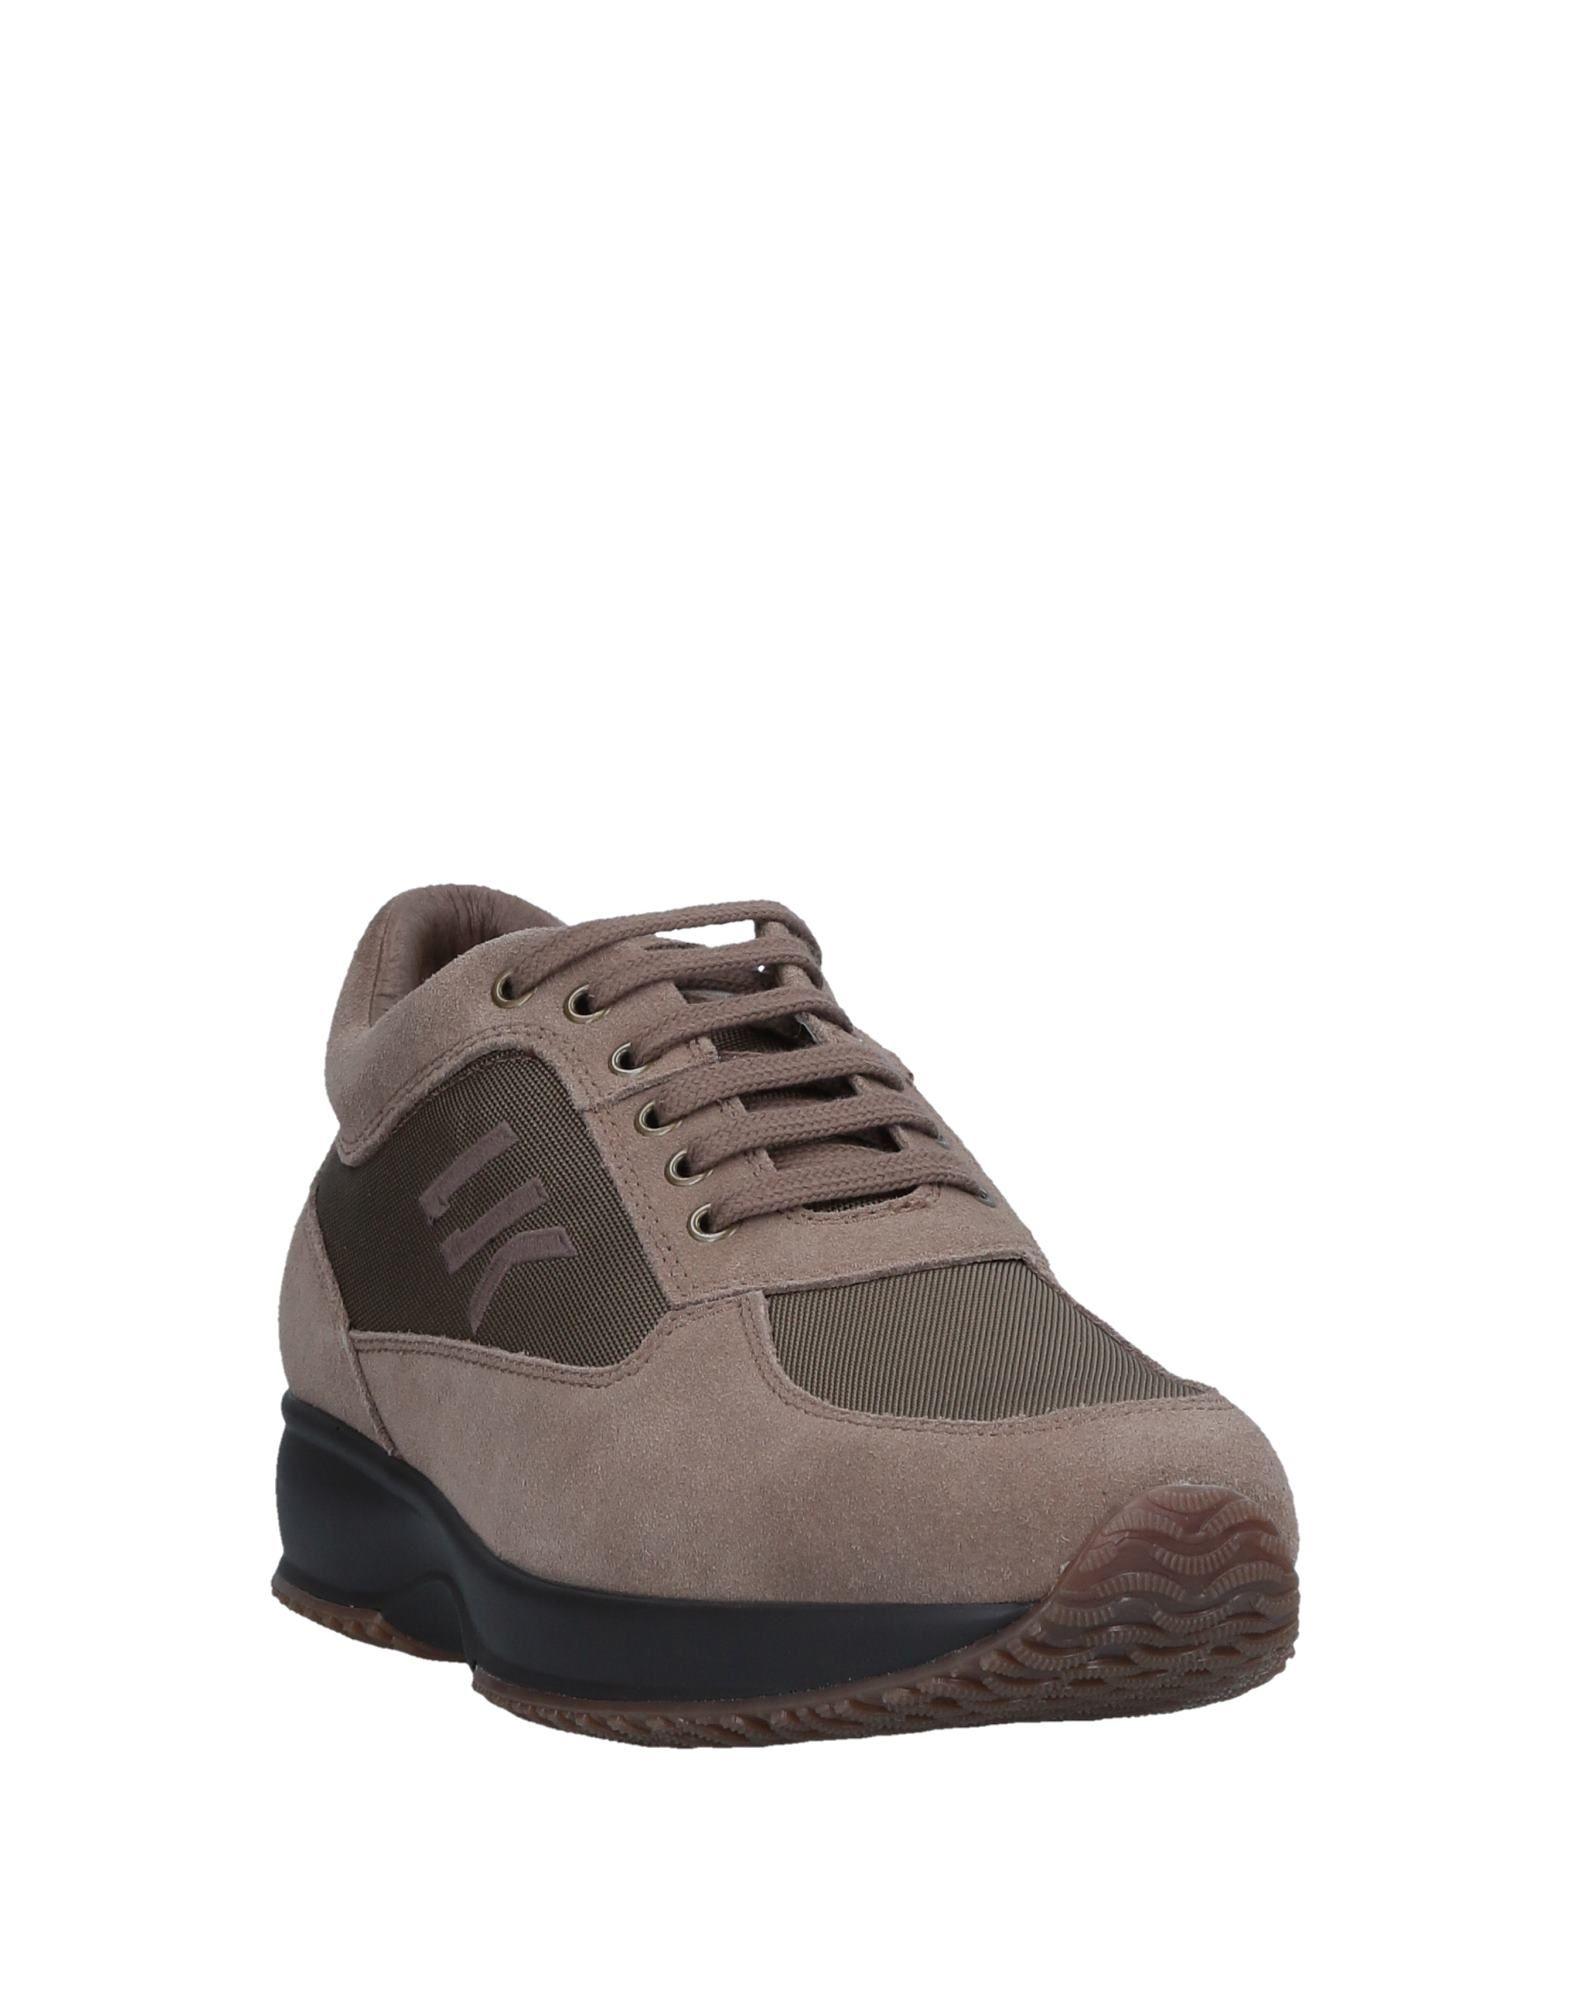 1b2d8302696 LUMBERJACK ΠΑΠΟΥΤΣΙΑ Παπούτσια τένις χαμηλά, Ανδρικά παπούτσια τέννις,  ΑΝΔΡΑΣ | ΠΑΠΟΥΤΣΙΑ | ΤΕΝΝΙΣ